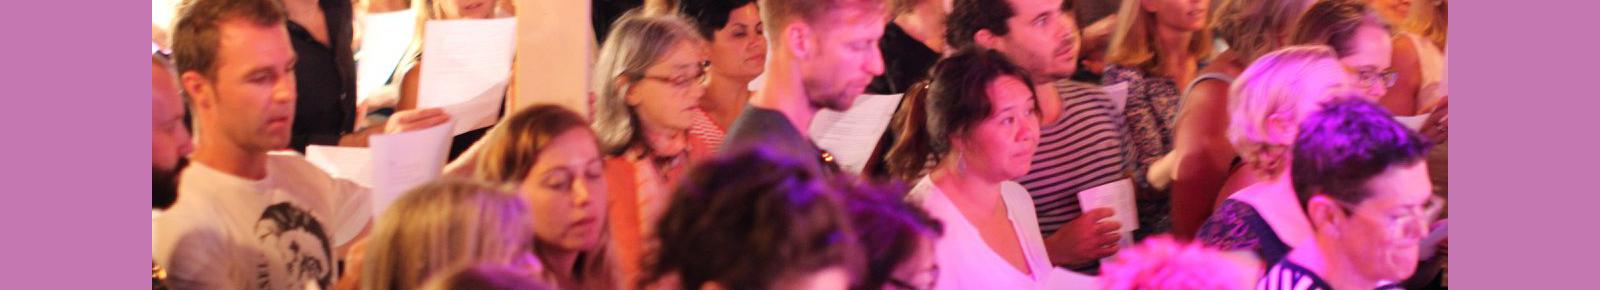 The Welcome Choir - Casula Powerhouse Arts Centre